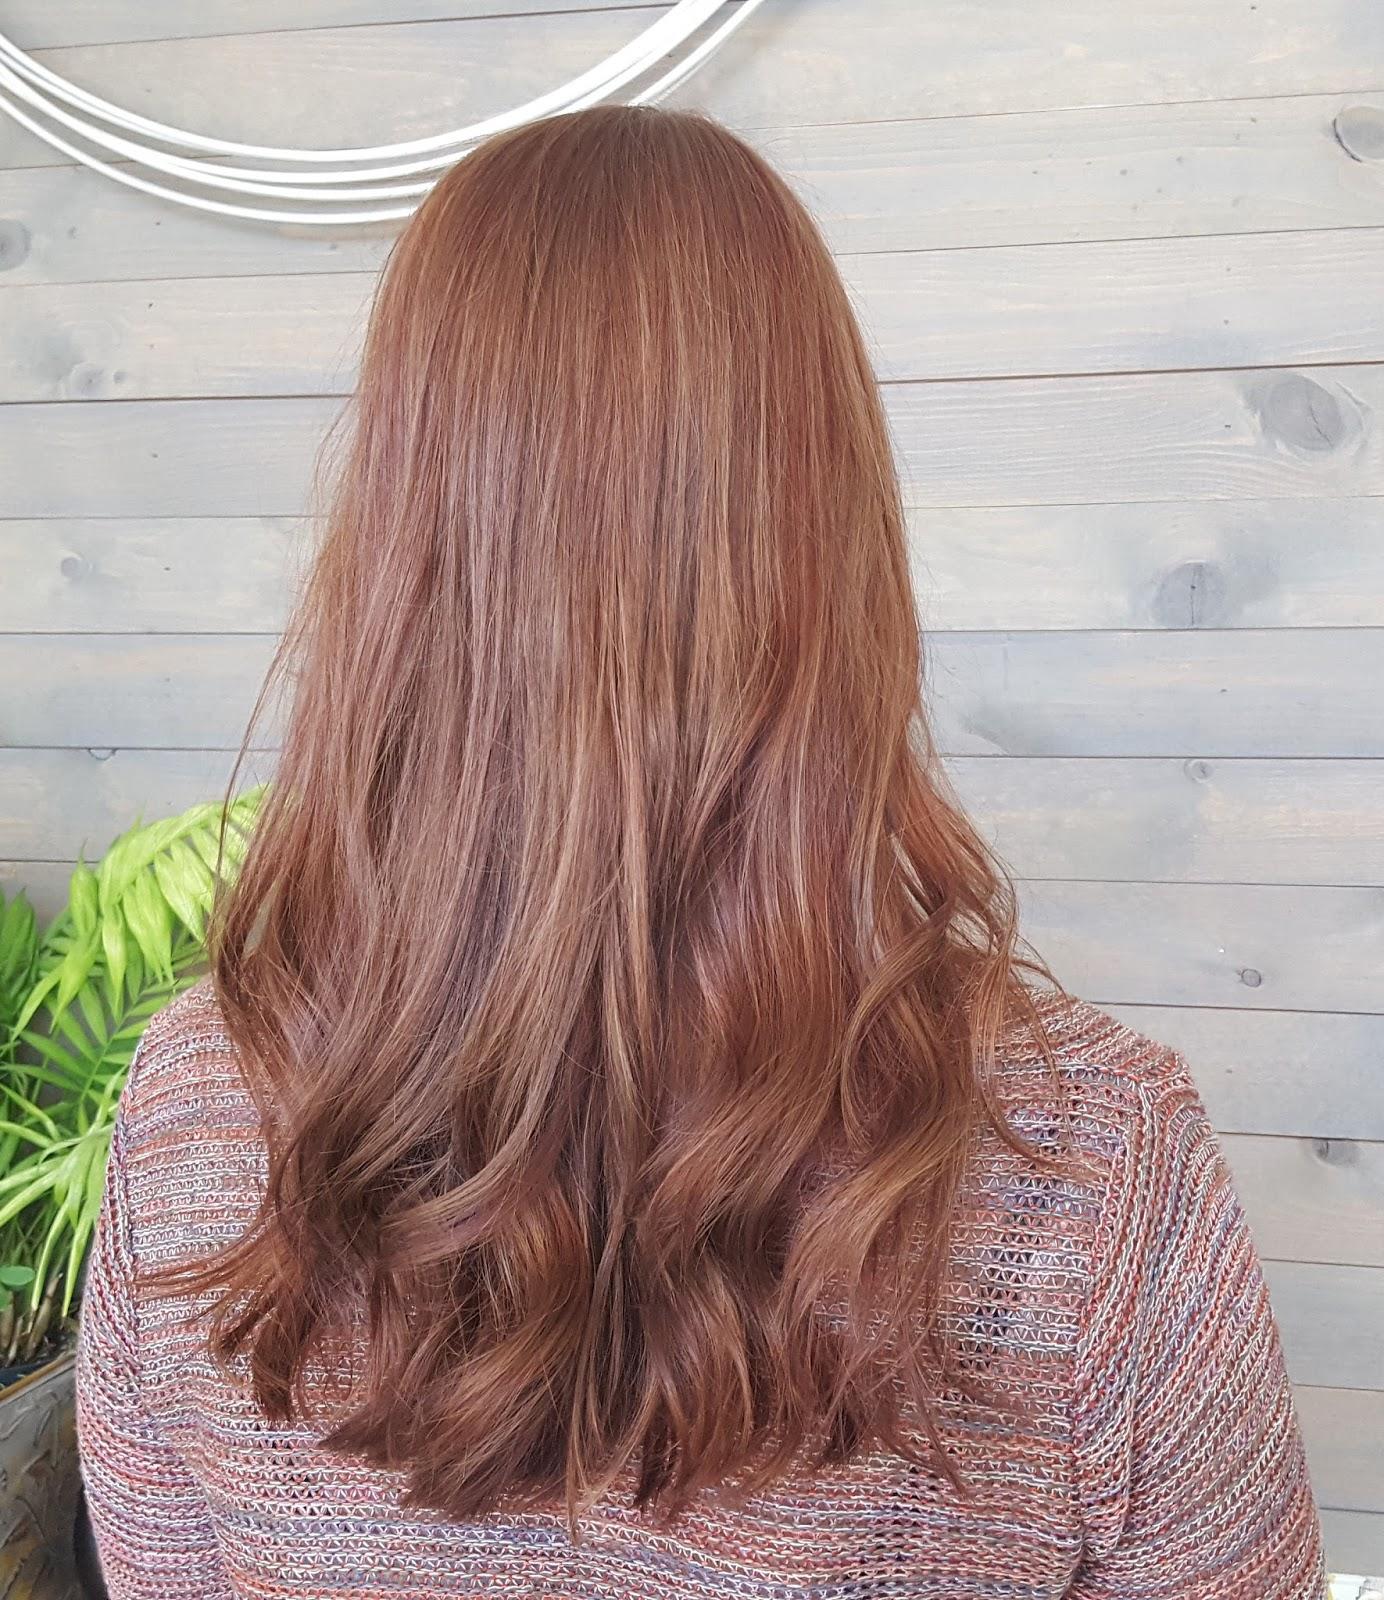 Christianes Hair Design 801 560 4055